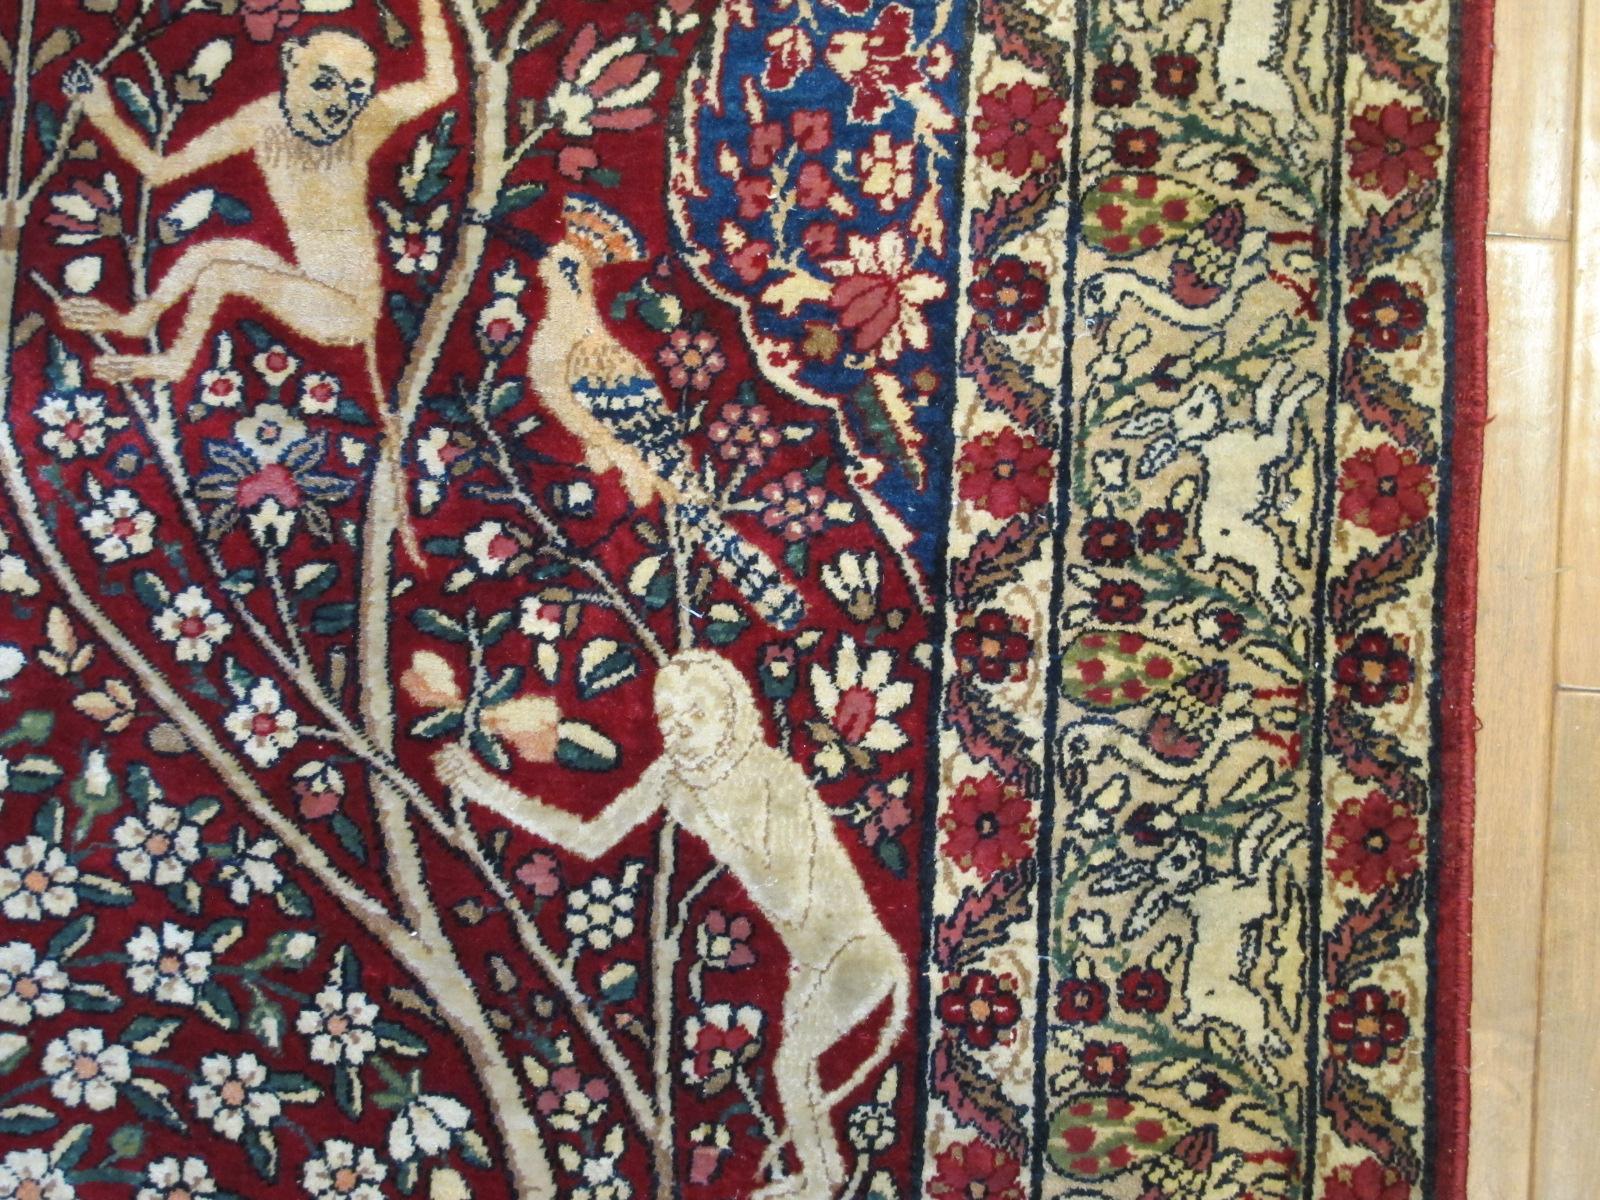 21427 antique persian kerman laver rug 4,6 x 6,4 (2)